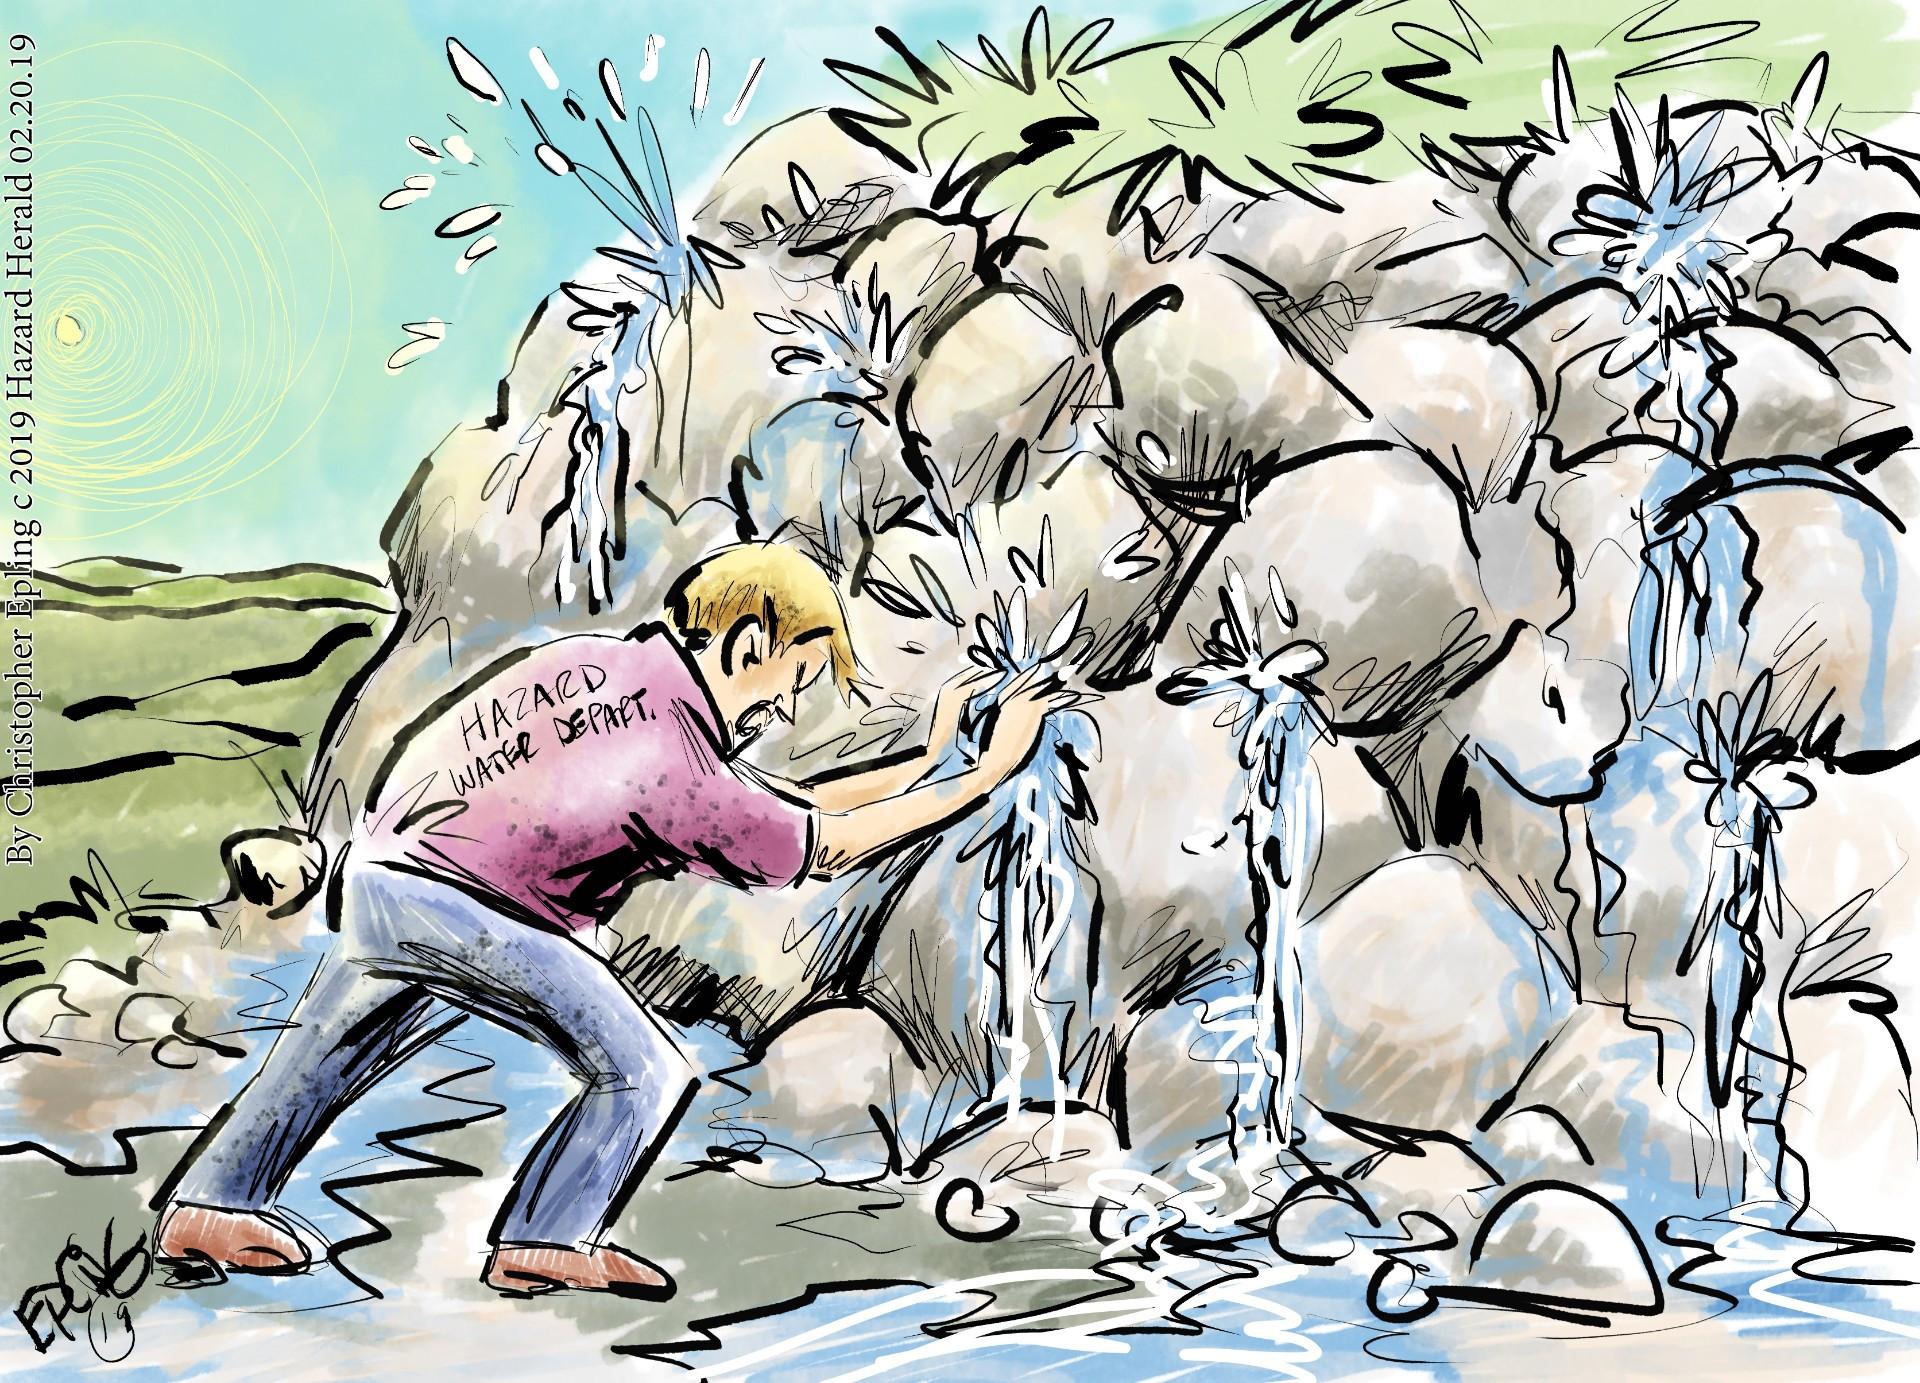 epling hazard water 02.20.19